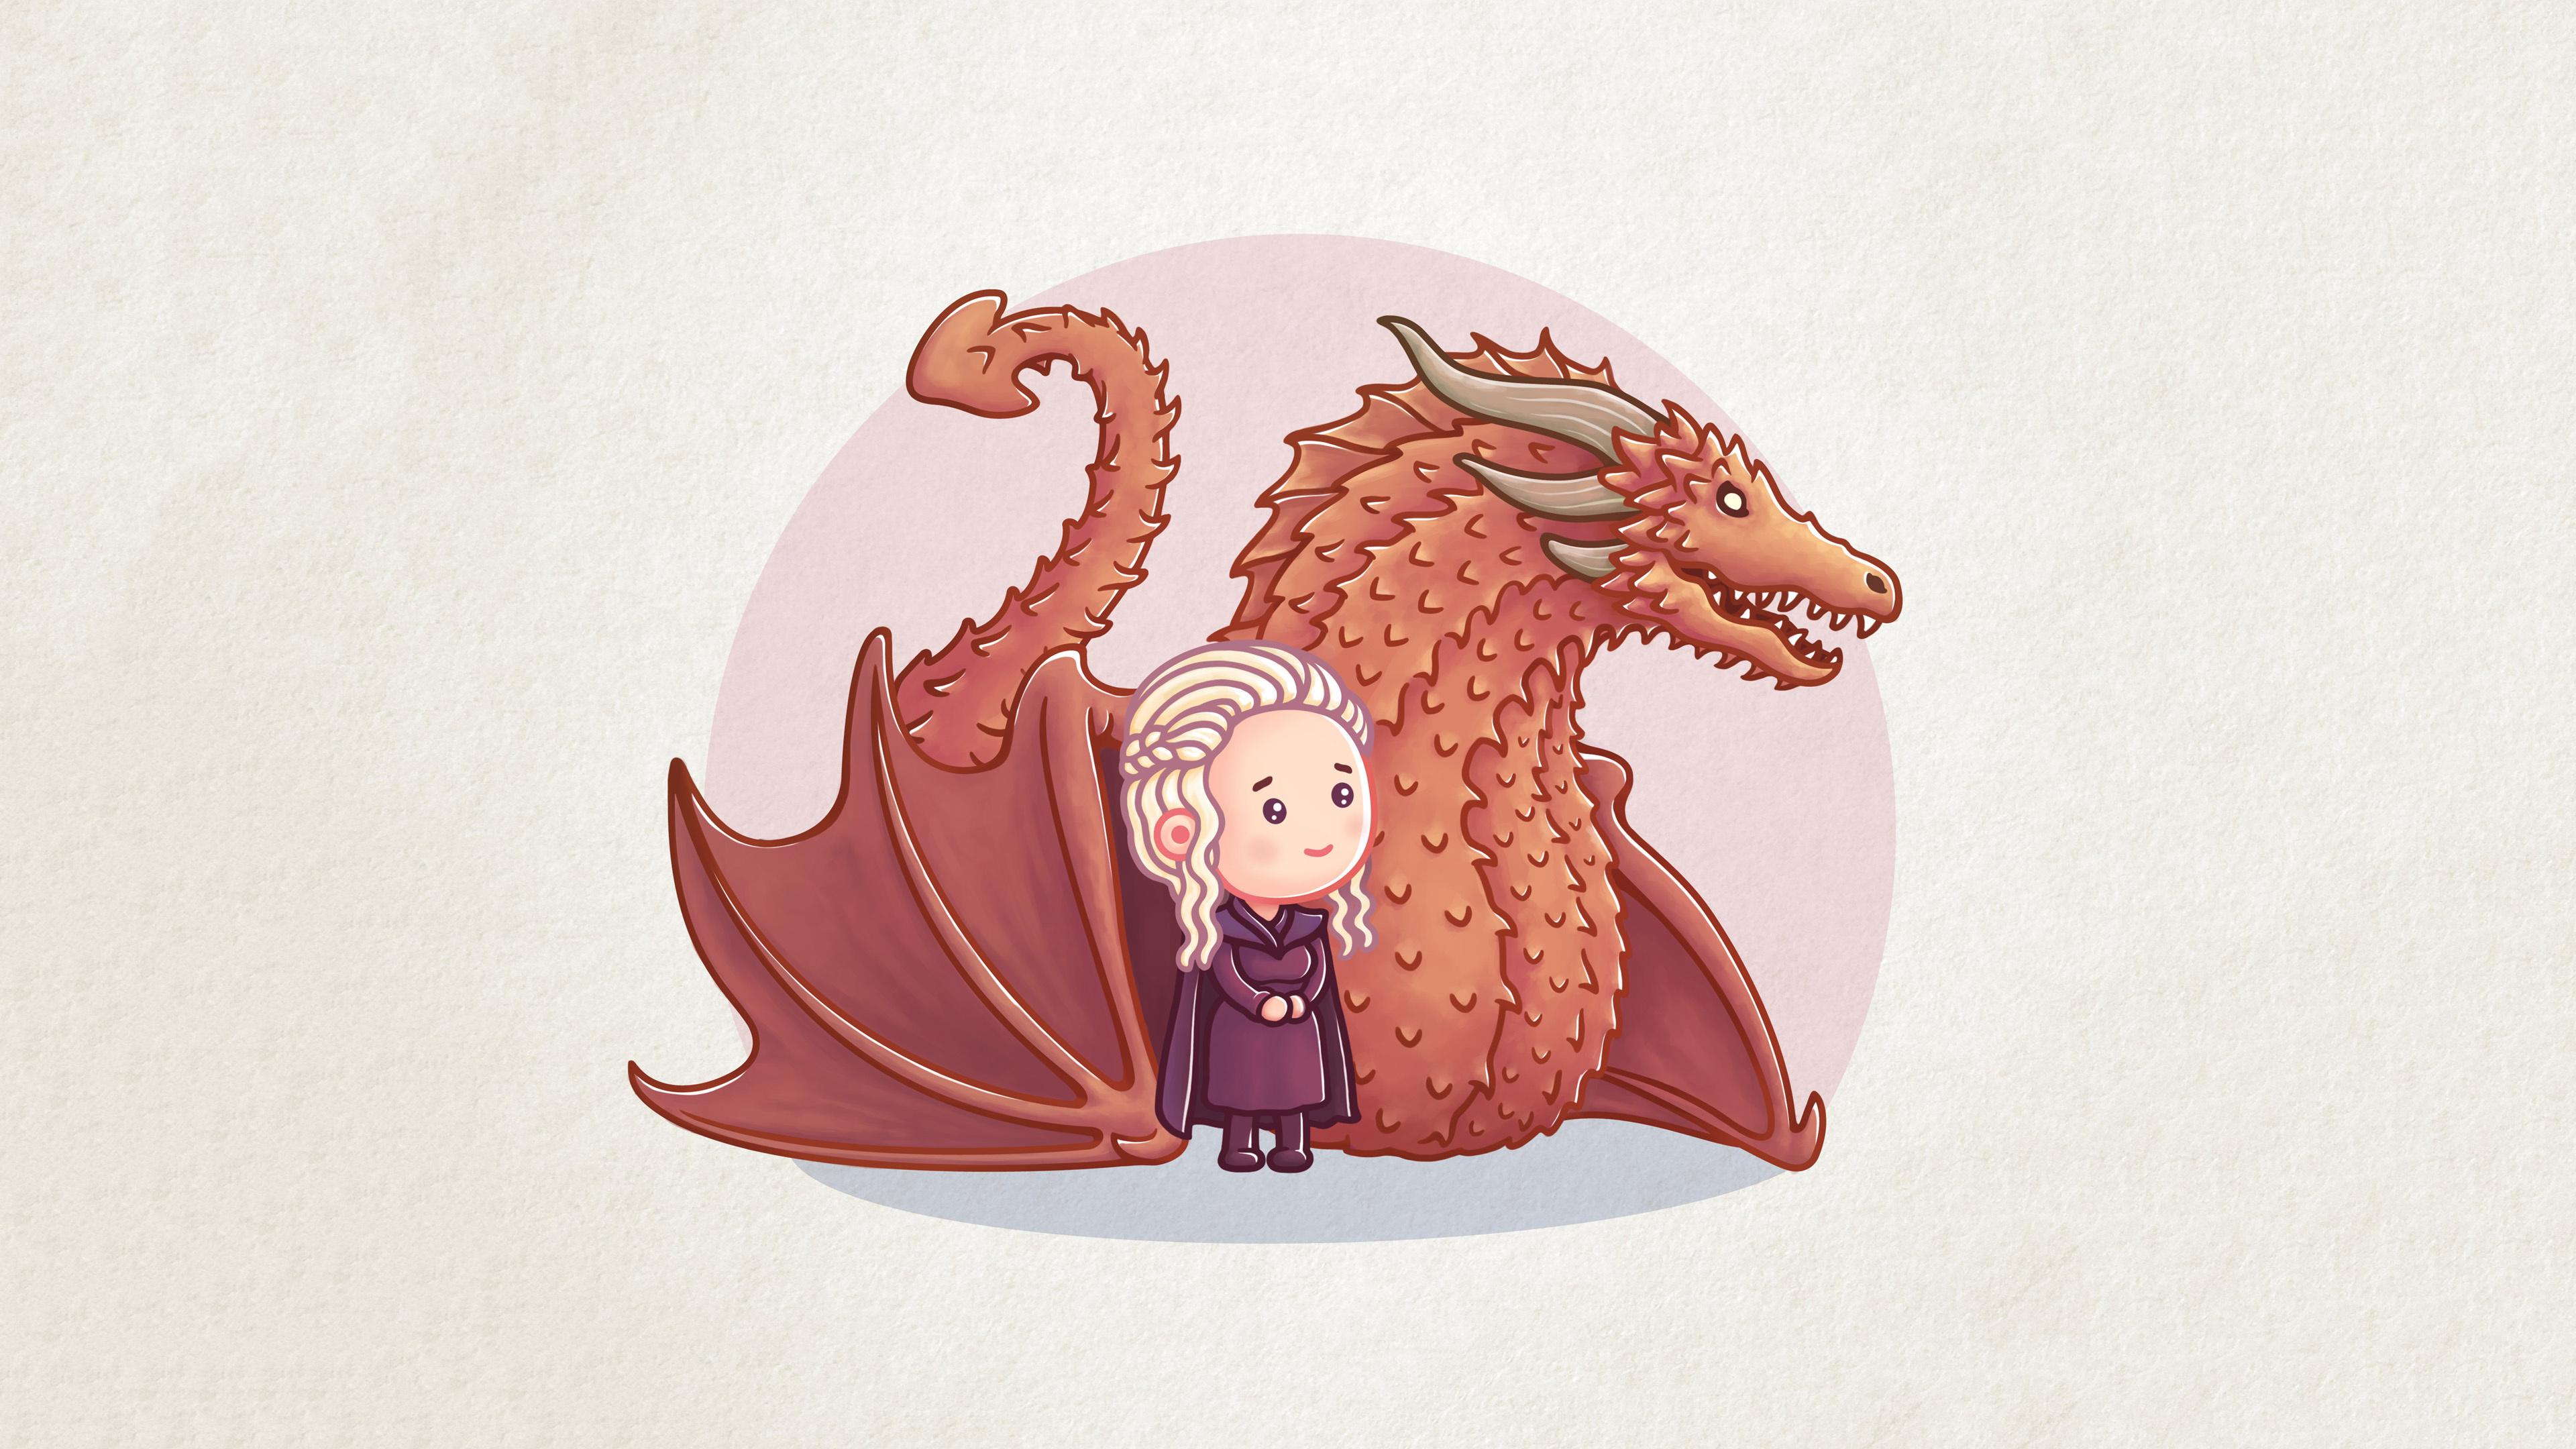 Download 3840x2400 Wallpaper Dragon Queen Khaleesi